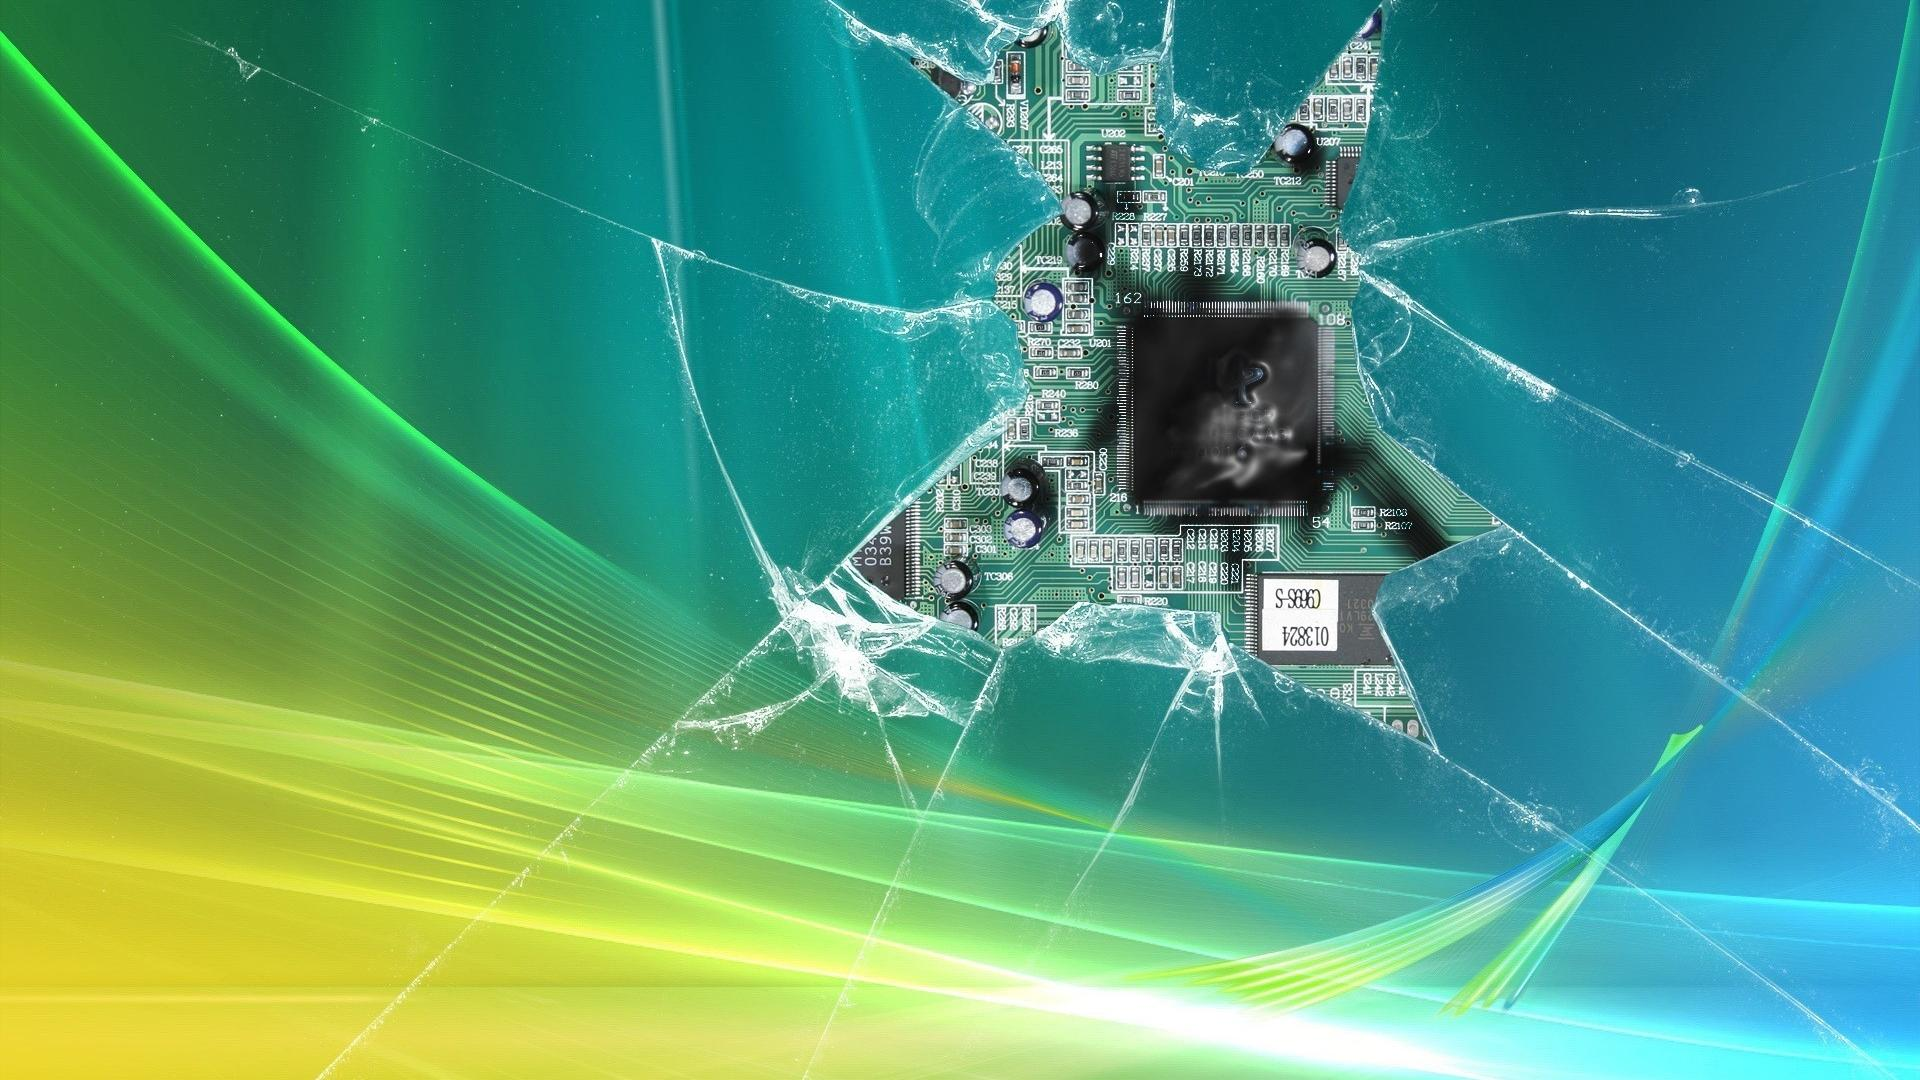 Broken Windows Backgrounds wallpaper Broken Windows Backgrounds hd 1920x1080